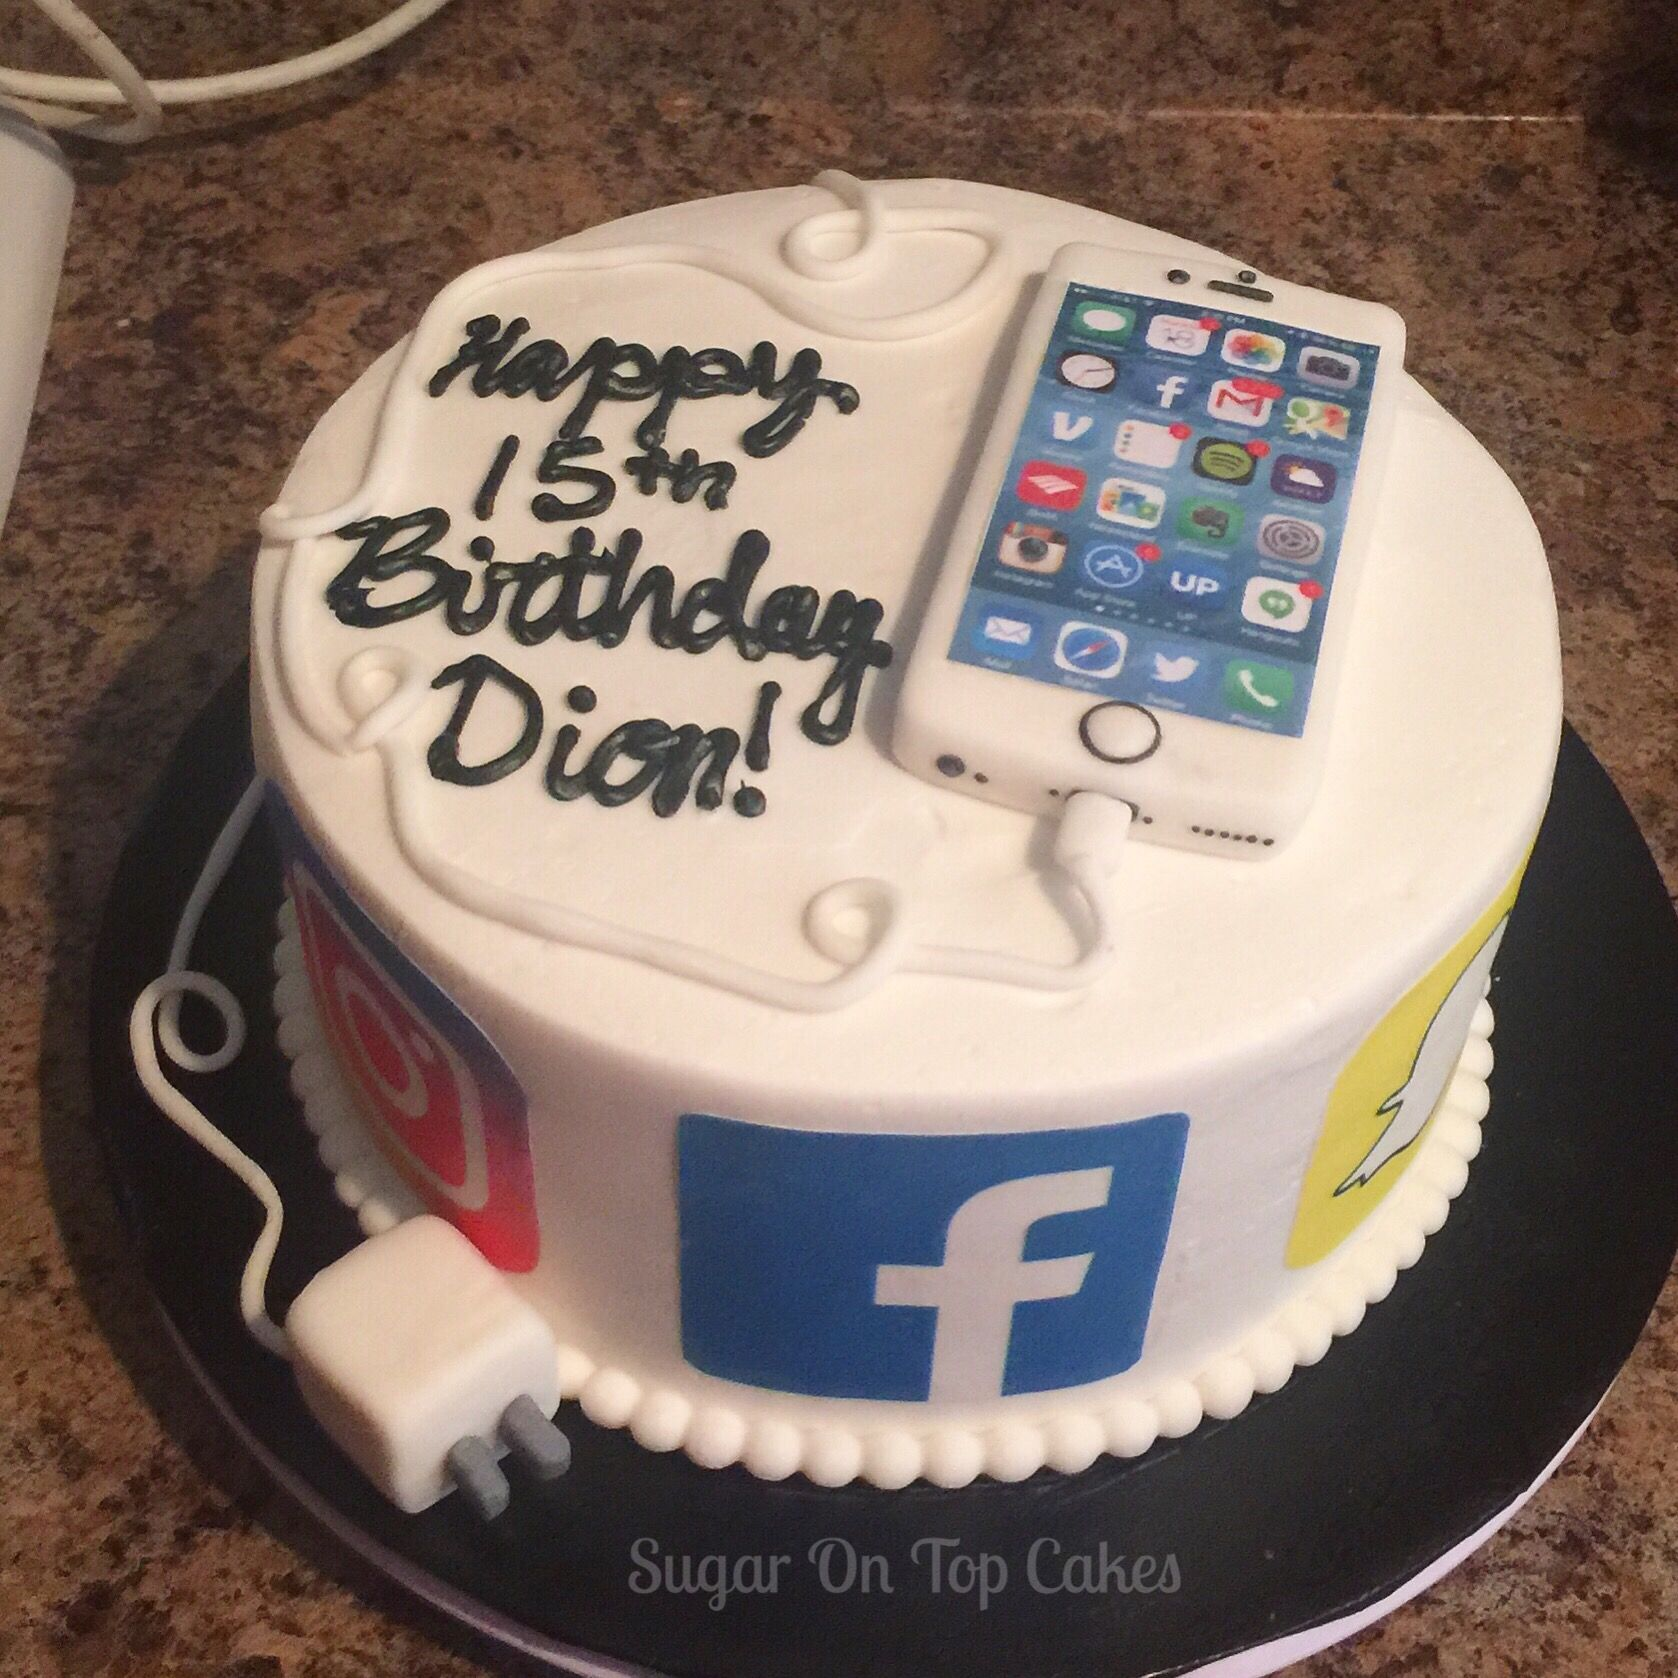 IPhone And Social Media Cake Facebook Instagram Snapchat Sugarontopcakes Sugarontopcakesandsweets